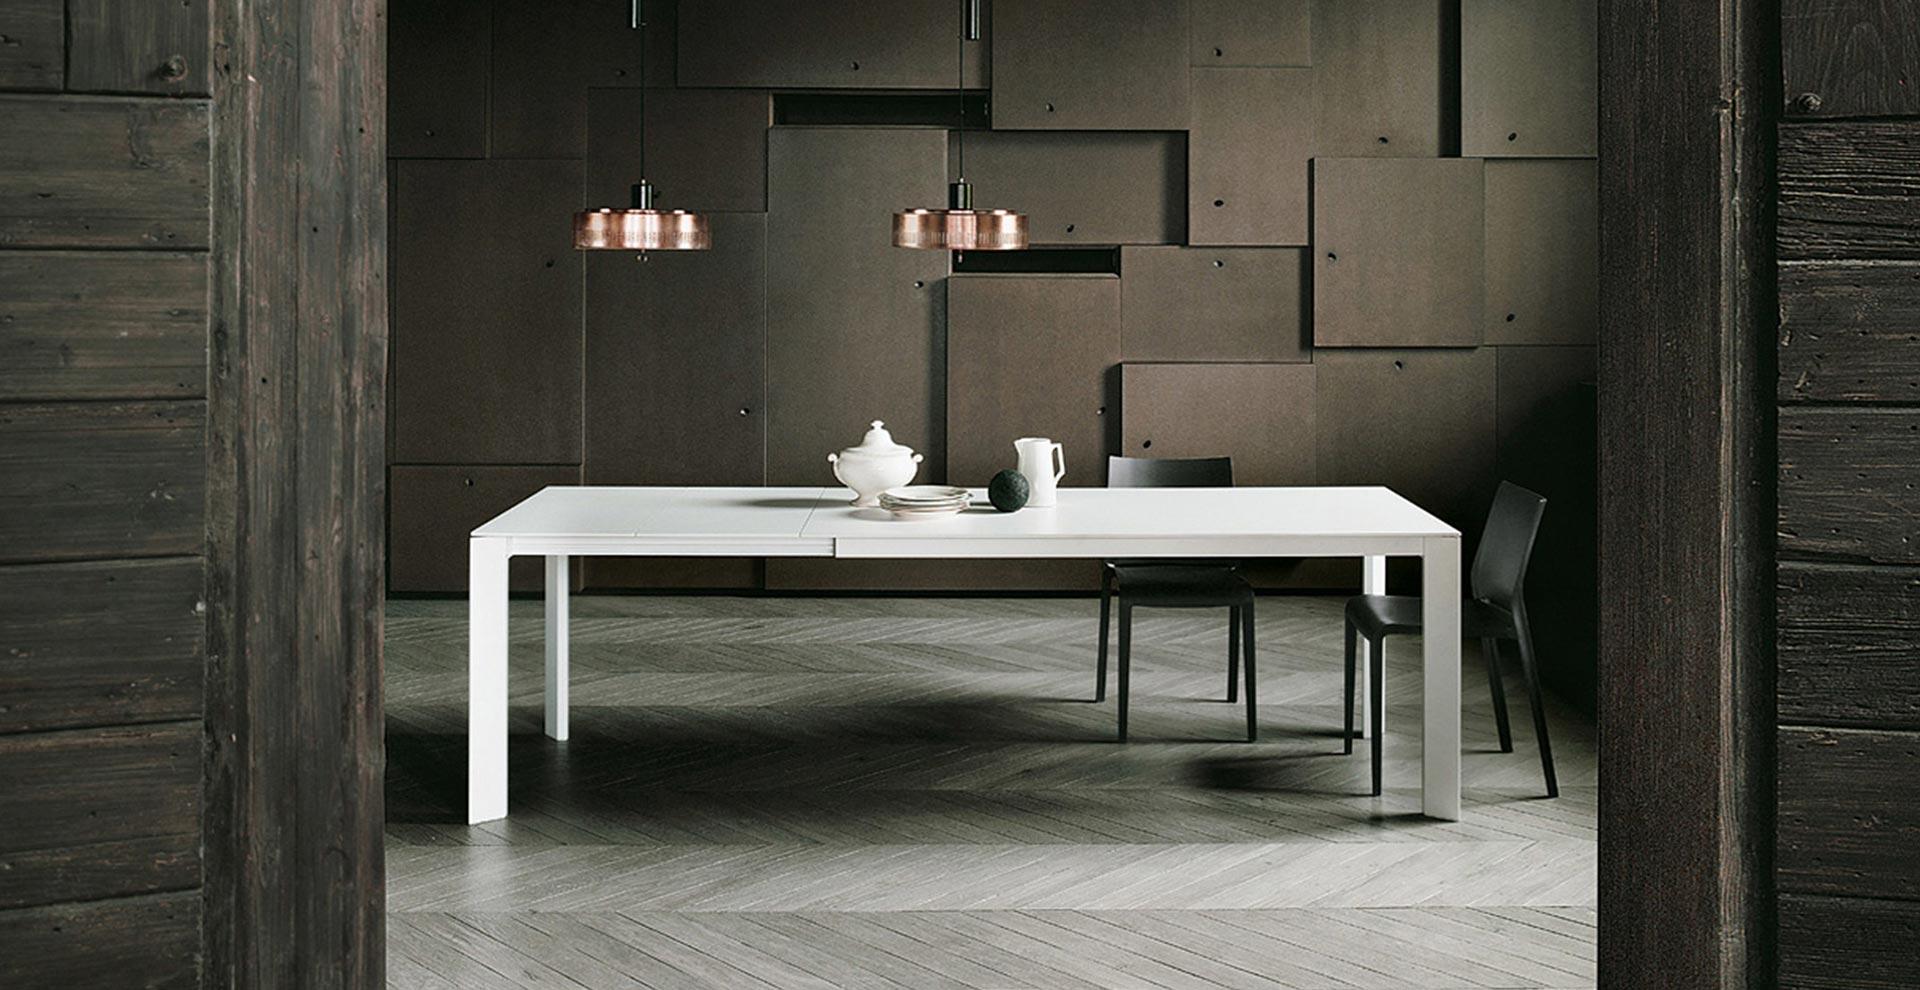 Tavoli Design Low Cost - Design Interno Ed Esterno - Azlit.net